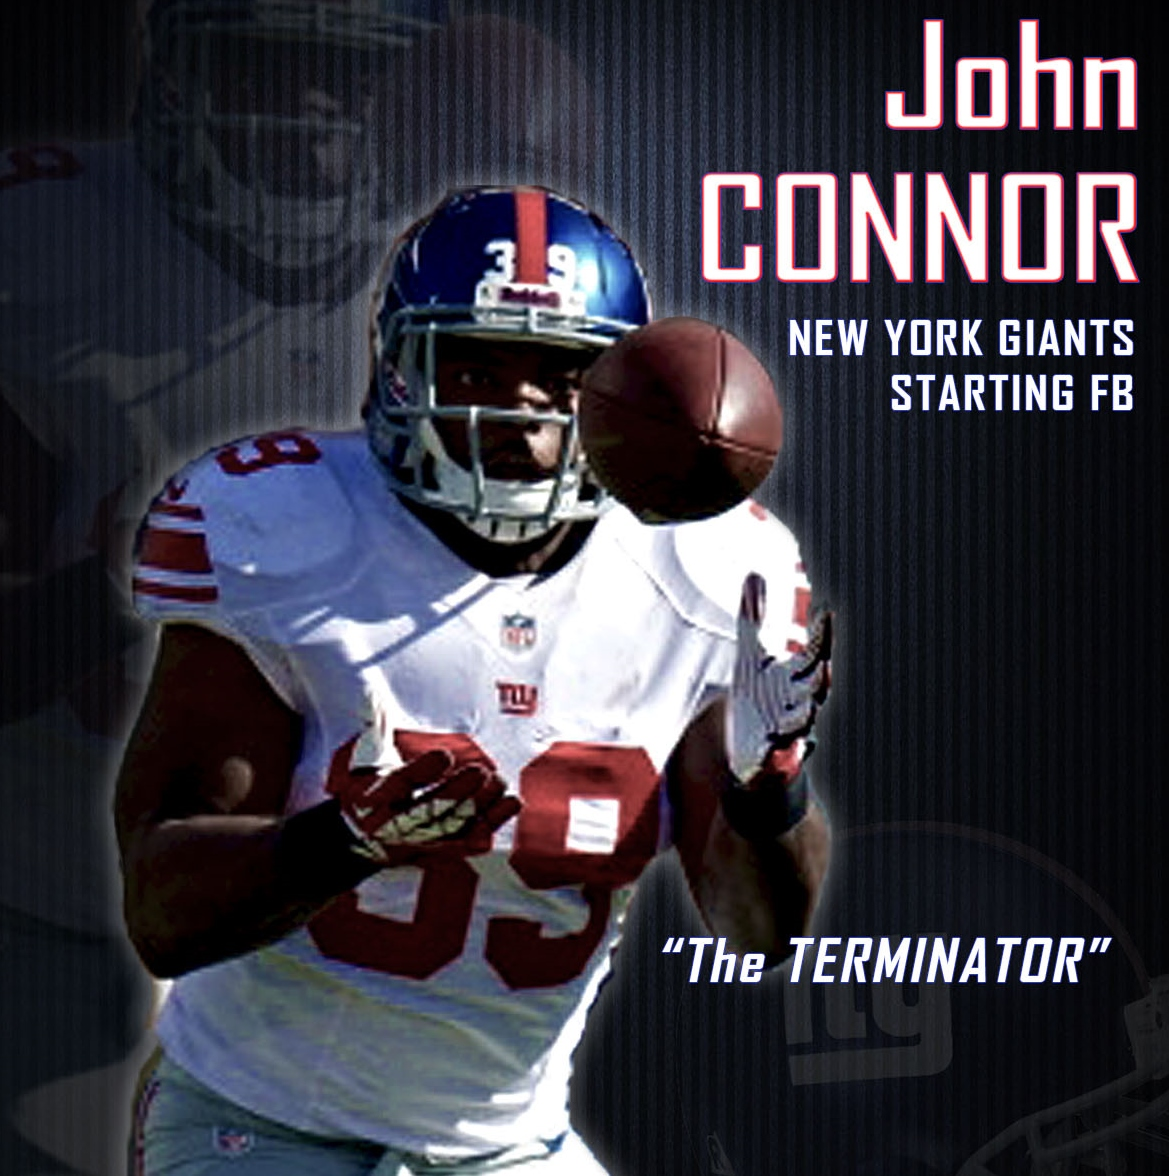 John Conner